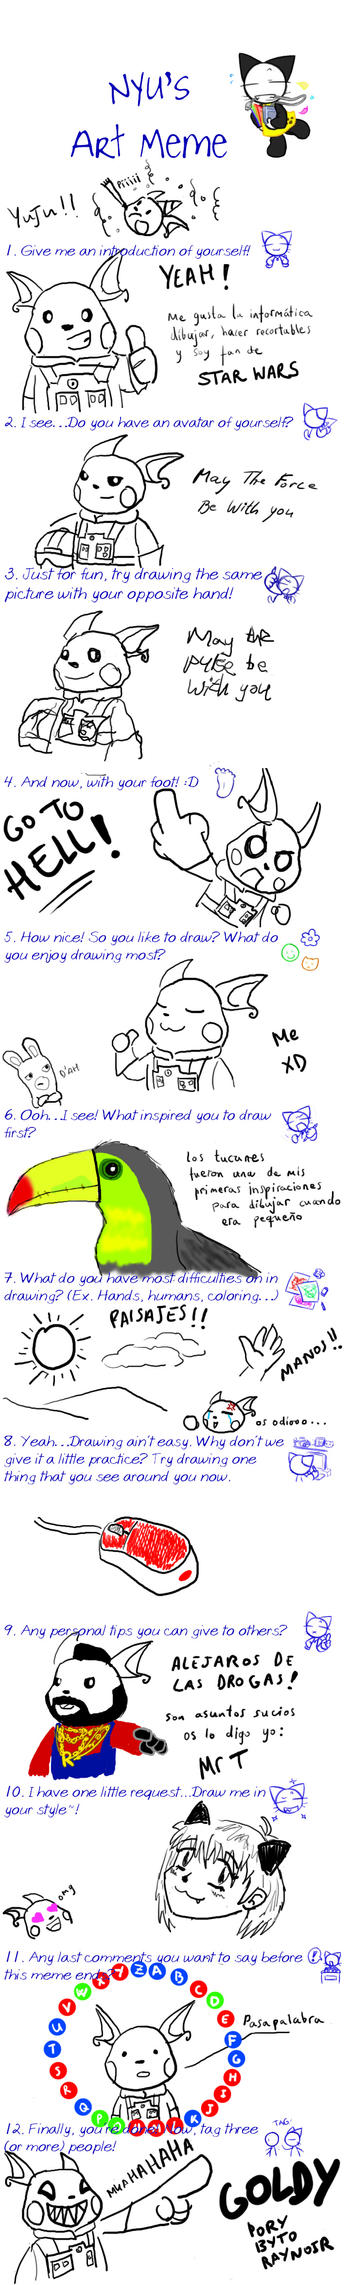 RoJo_5  Nyu's Art Meme by RoJo5